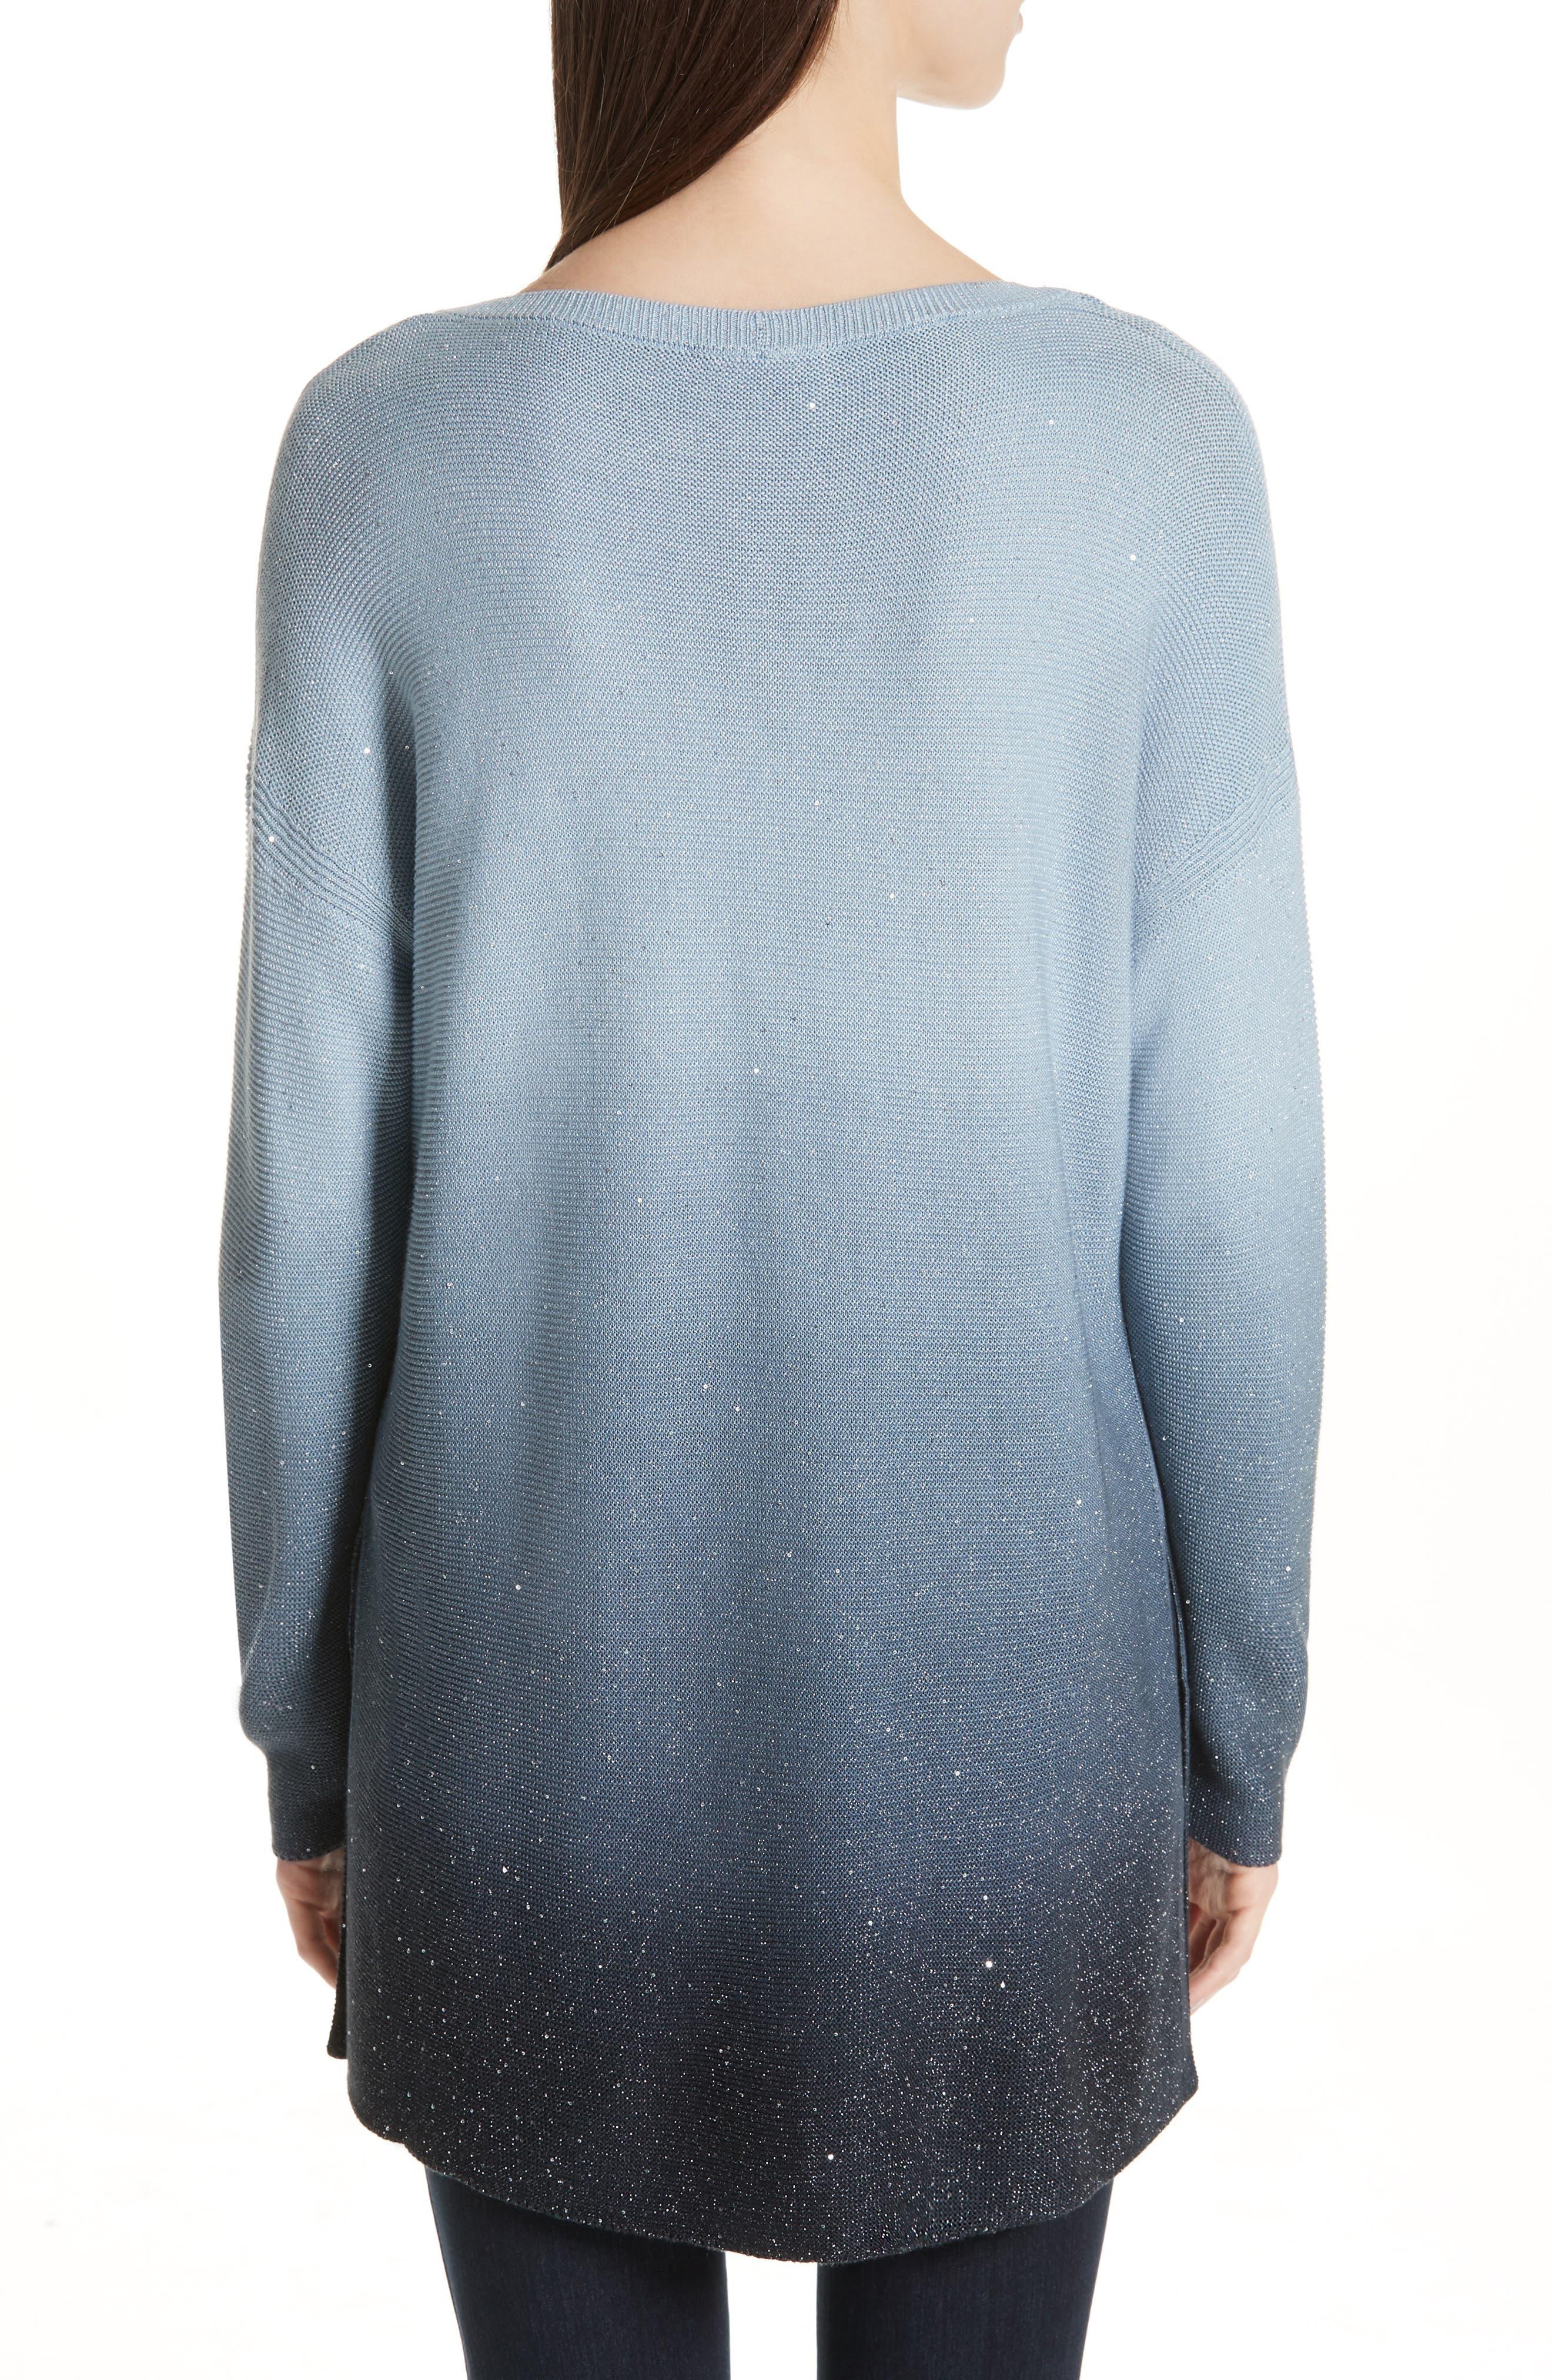 LAFAYETTE 148 NEW YORK, Sequin Ombré Silk Blend Tunic, Alternate thumbnail 2, color, SLATE BLUE MULTI